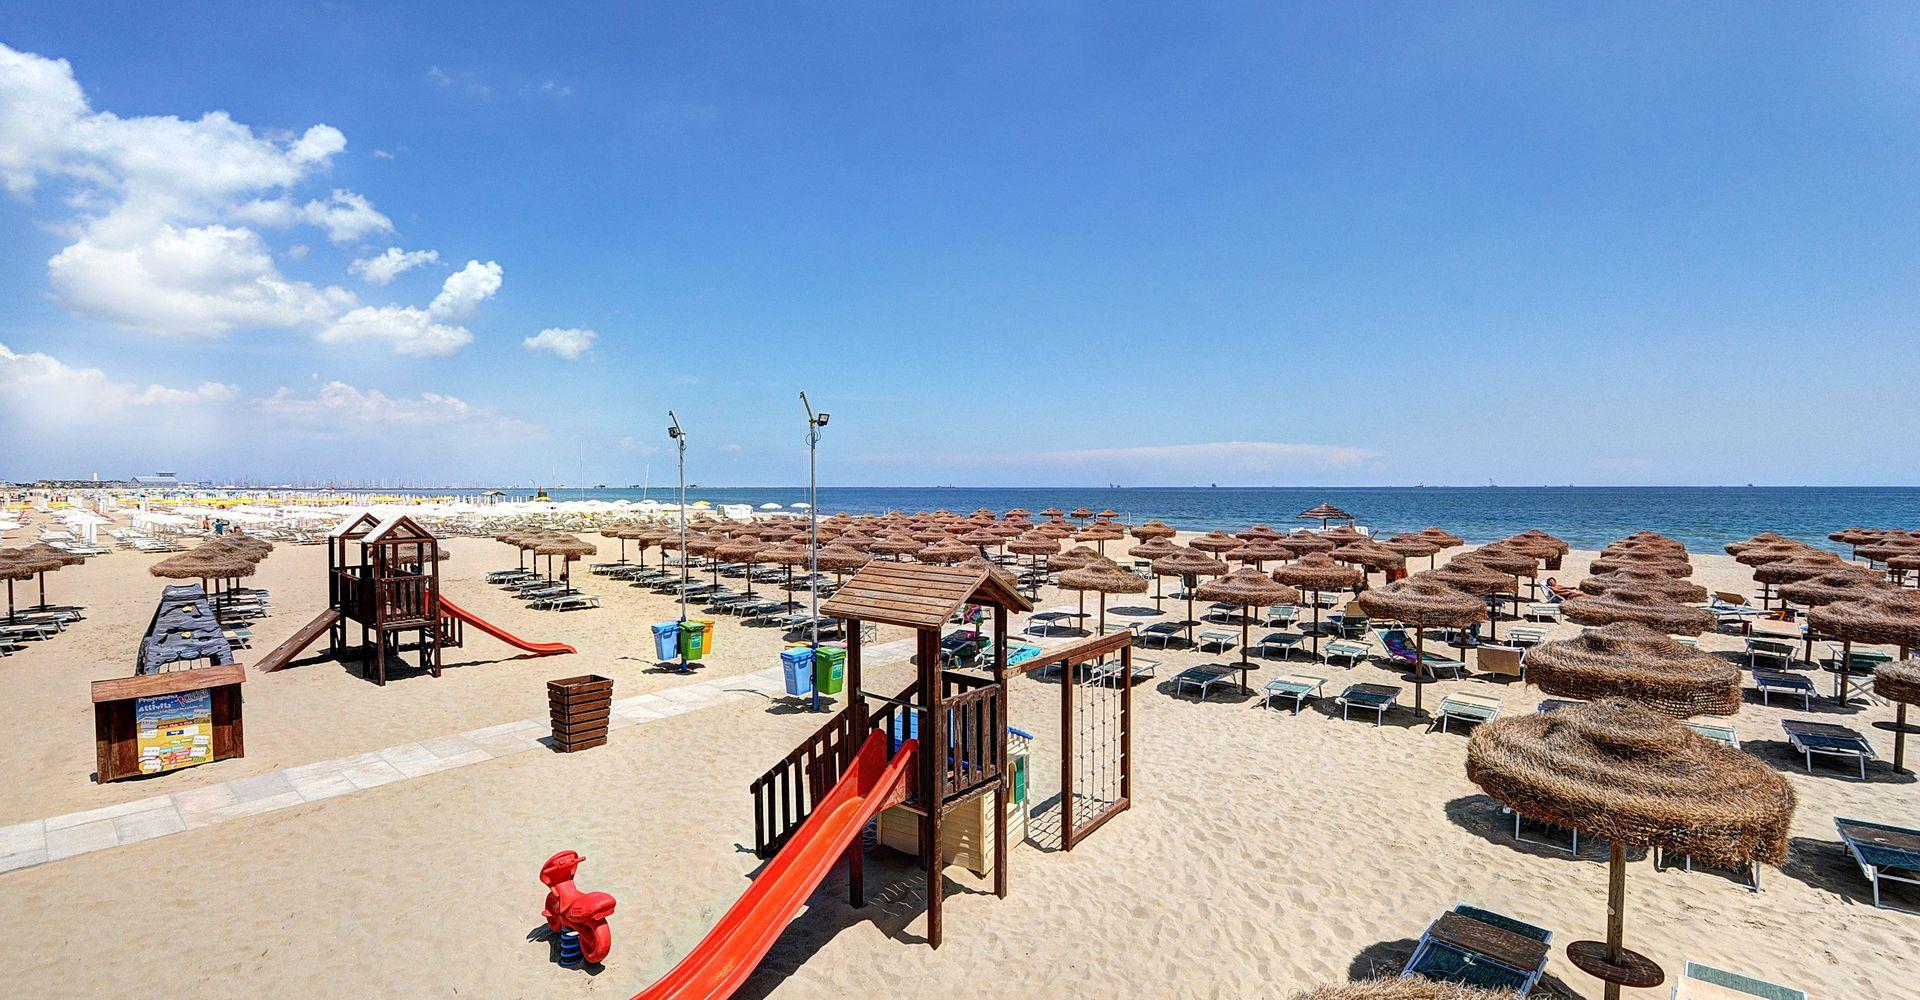 Matrimonio Spiaggia Marina Di Ravenna : Camping rivaverde emilia romagna italië anwb